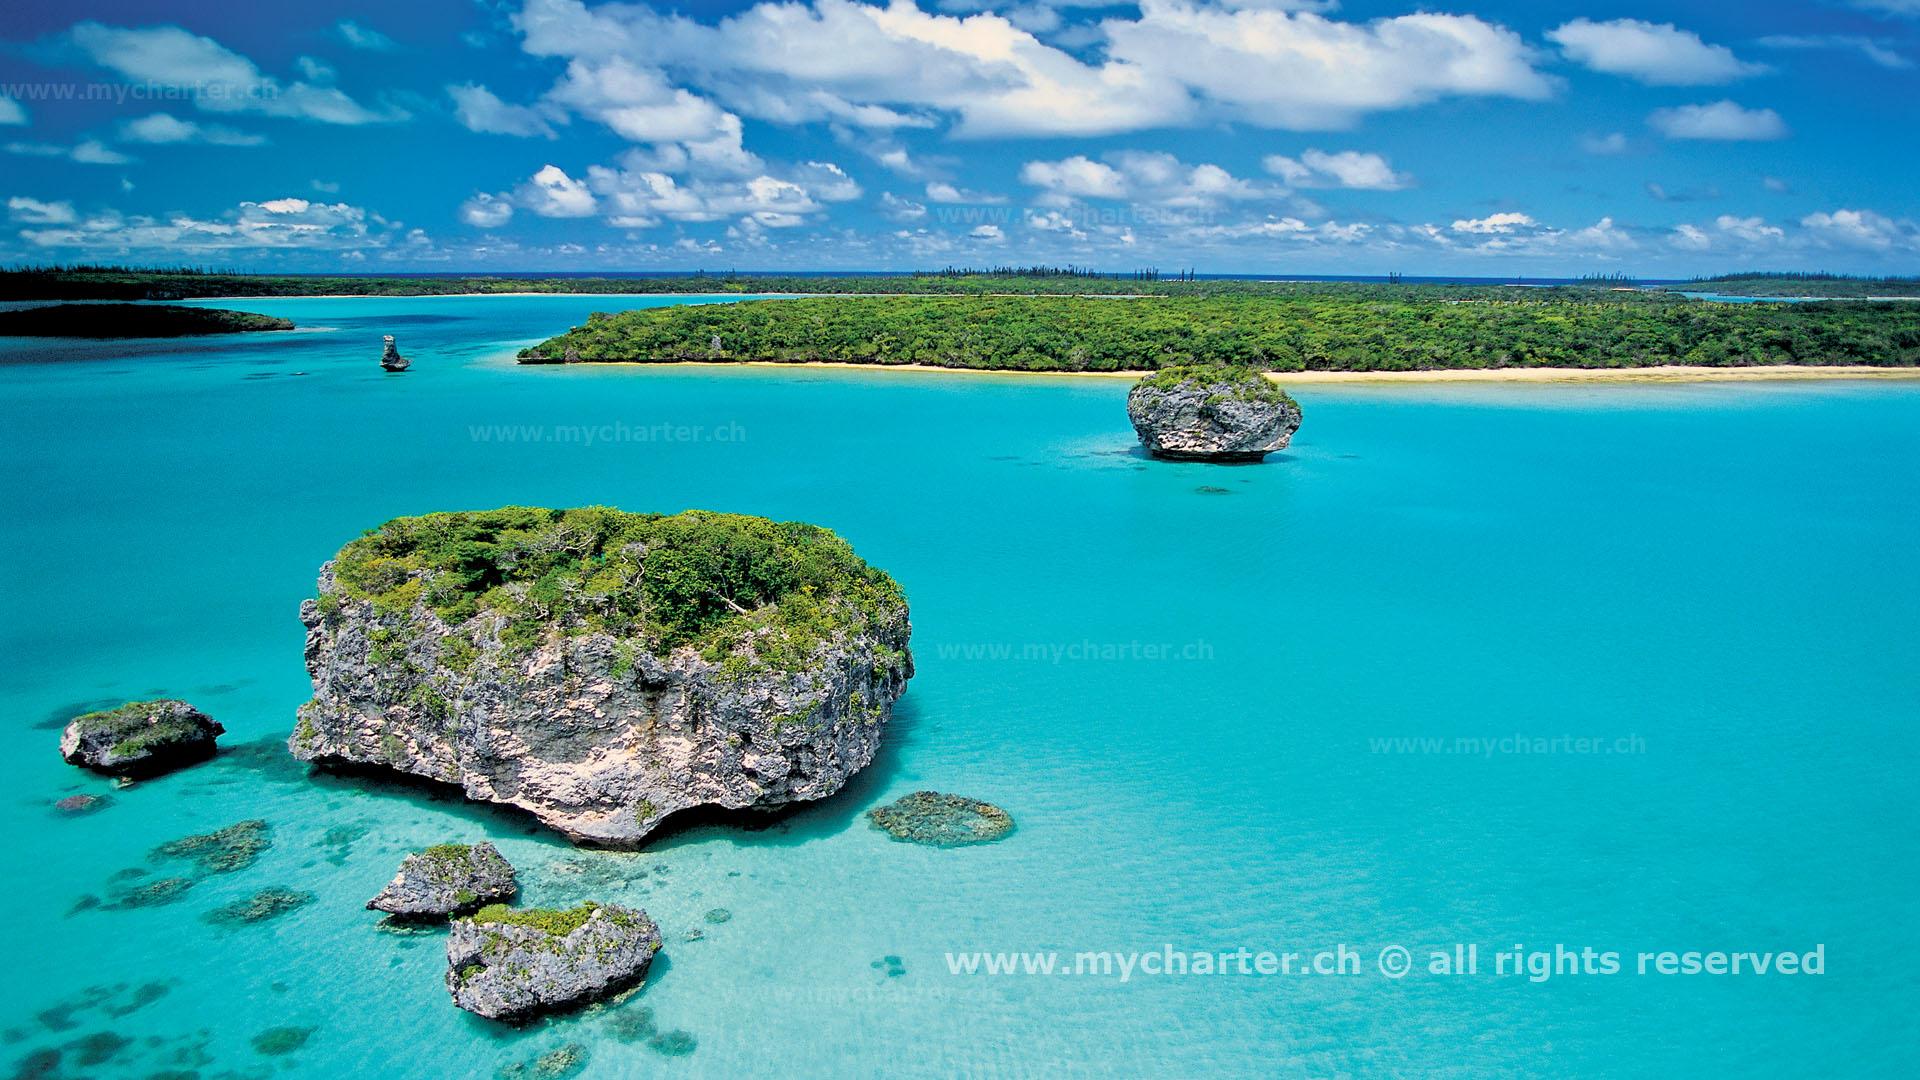 Yachtcharter Südesee - Neukaledonien - Baie d'Upi